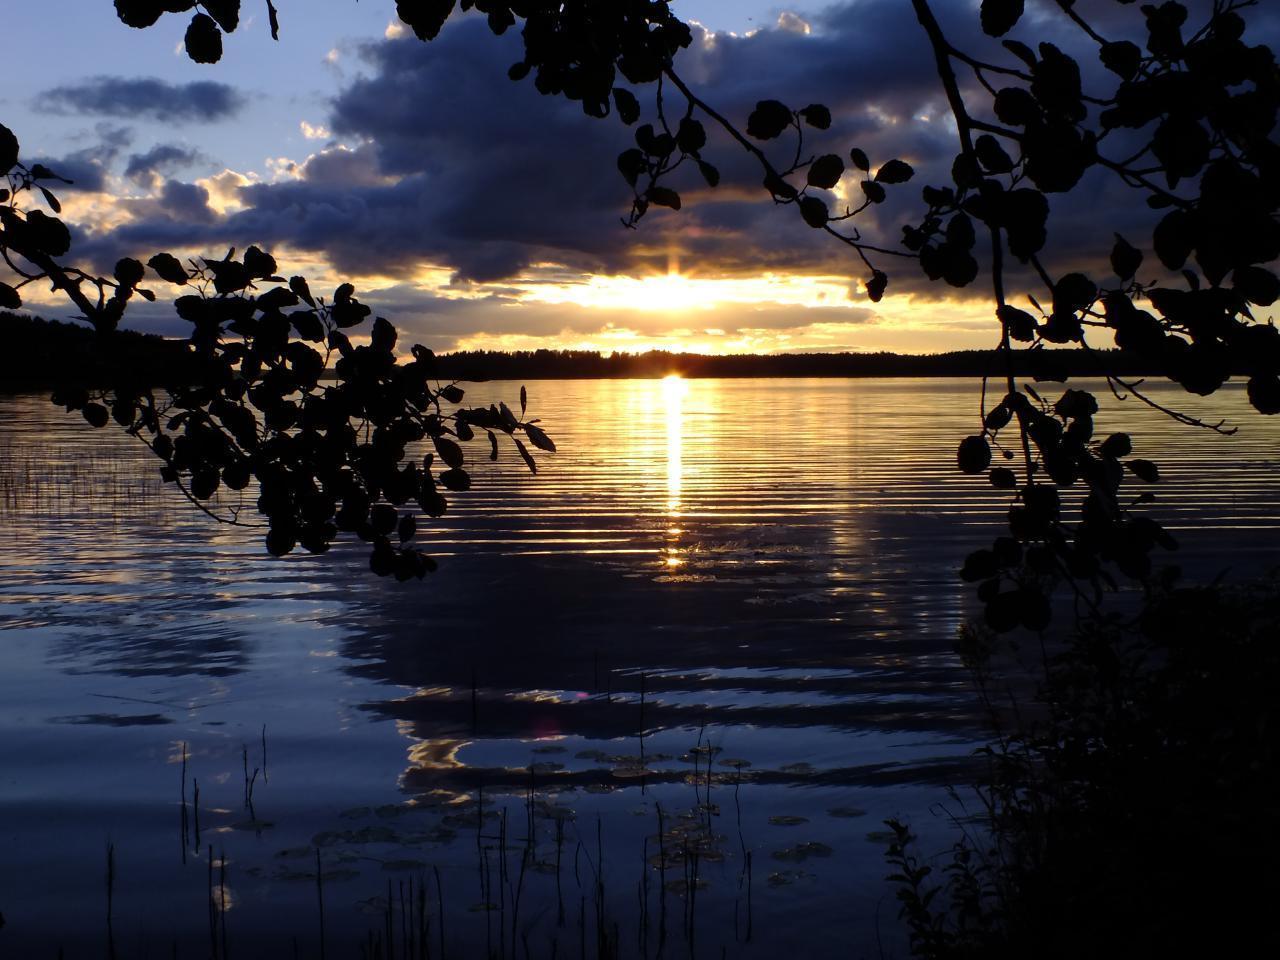 Ferienhaus - Mökki mit Sauna direkt am See  in Mouhijärvi-Sastamala (1707905), Mouhijärvi, , Westfinnland, Finnland, Bild 20